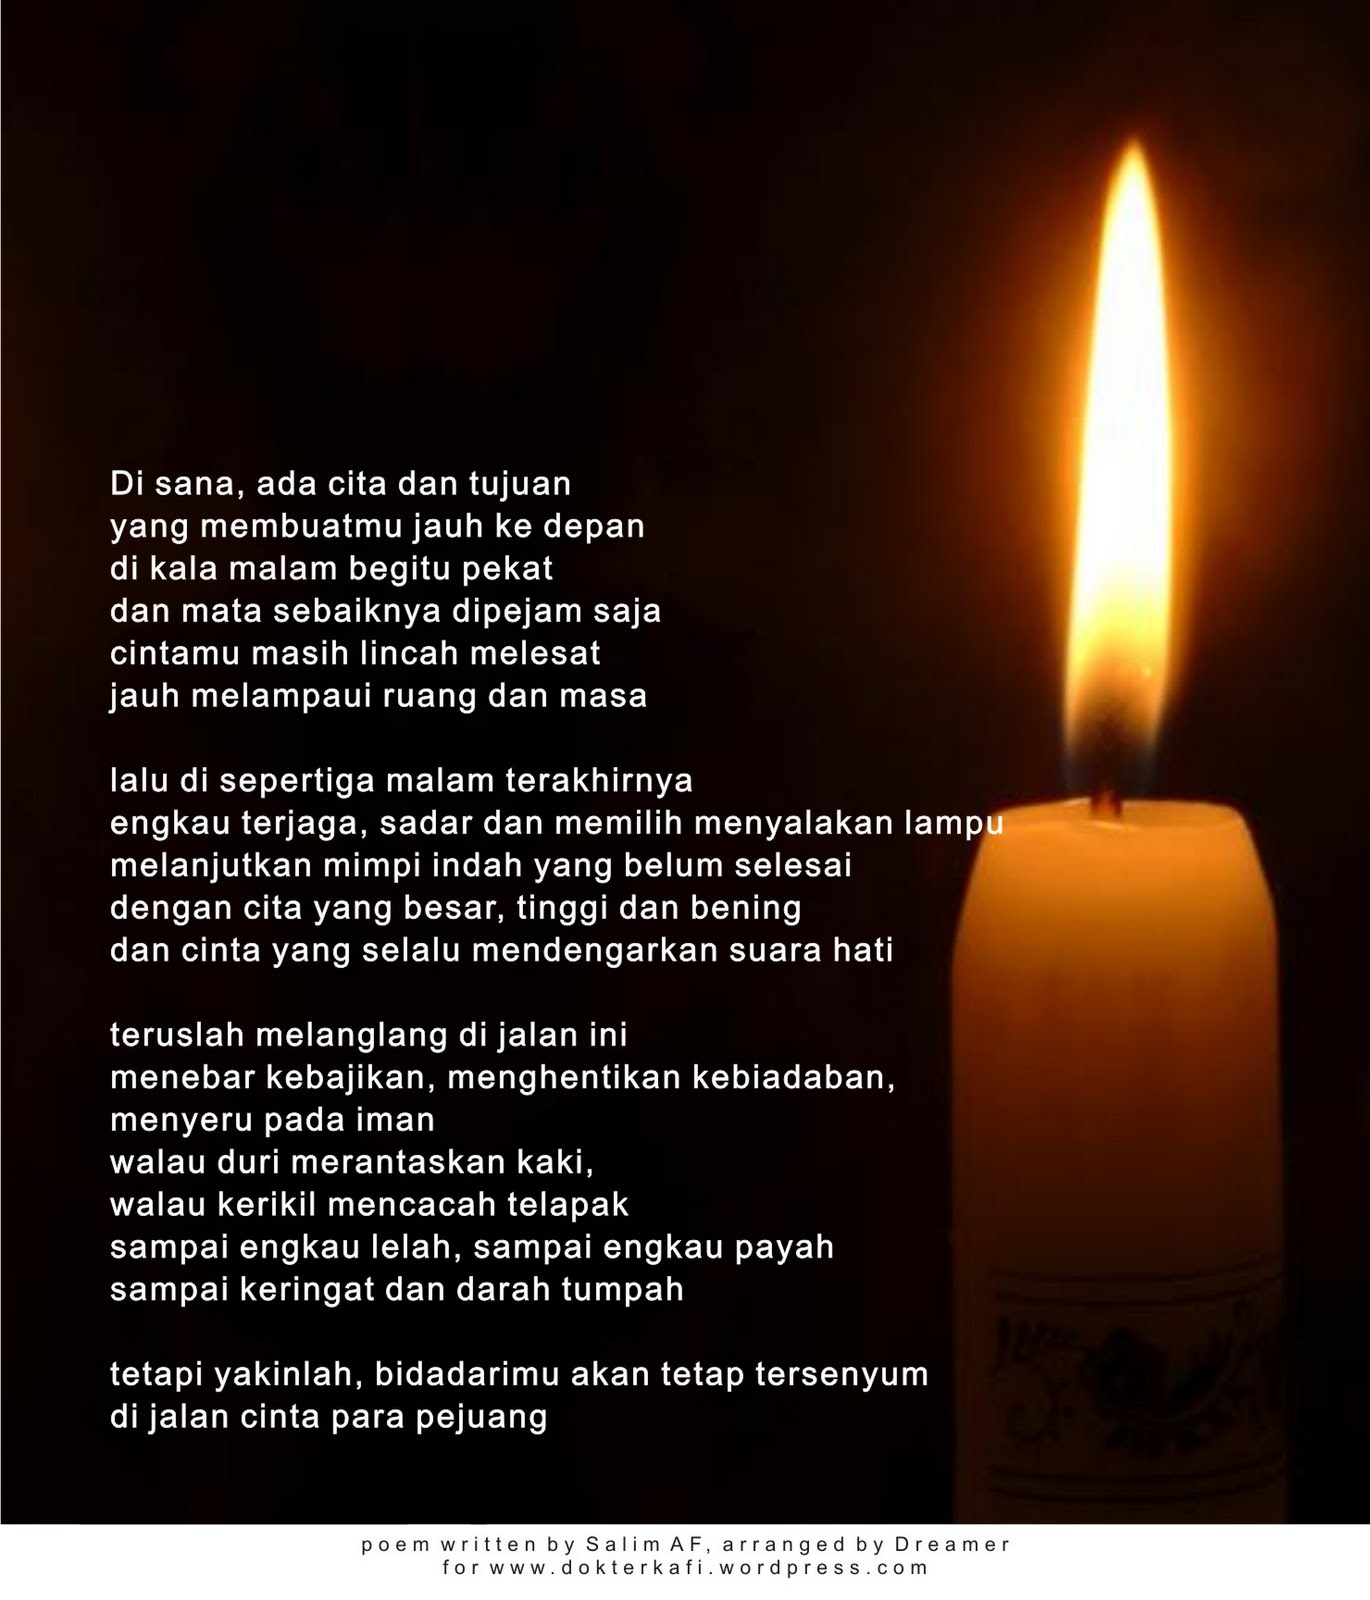 34 Kata Mutiara Bergambar Terbaru Inspirations Kata Mutiara Terbaru